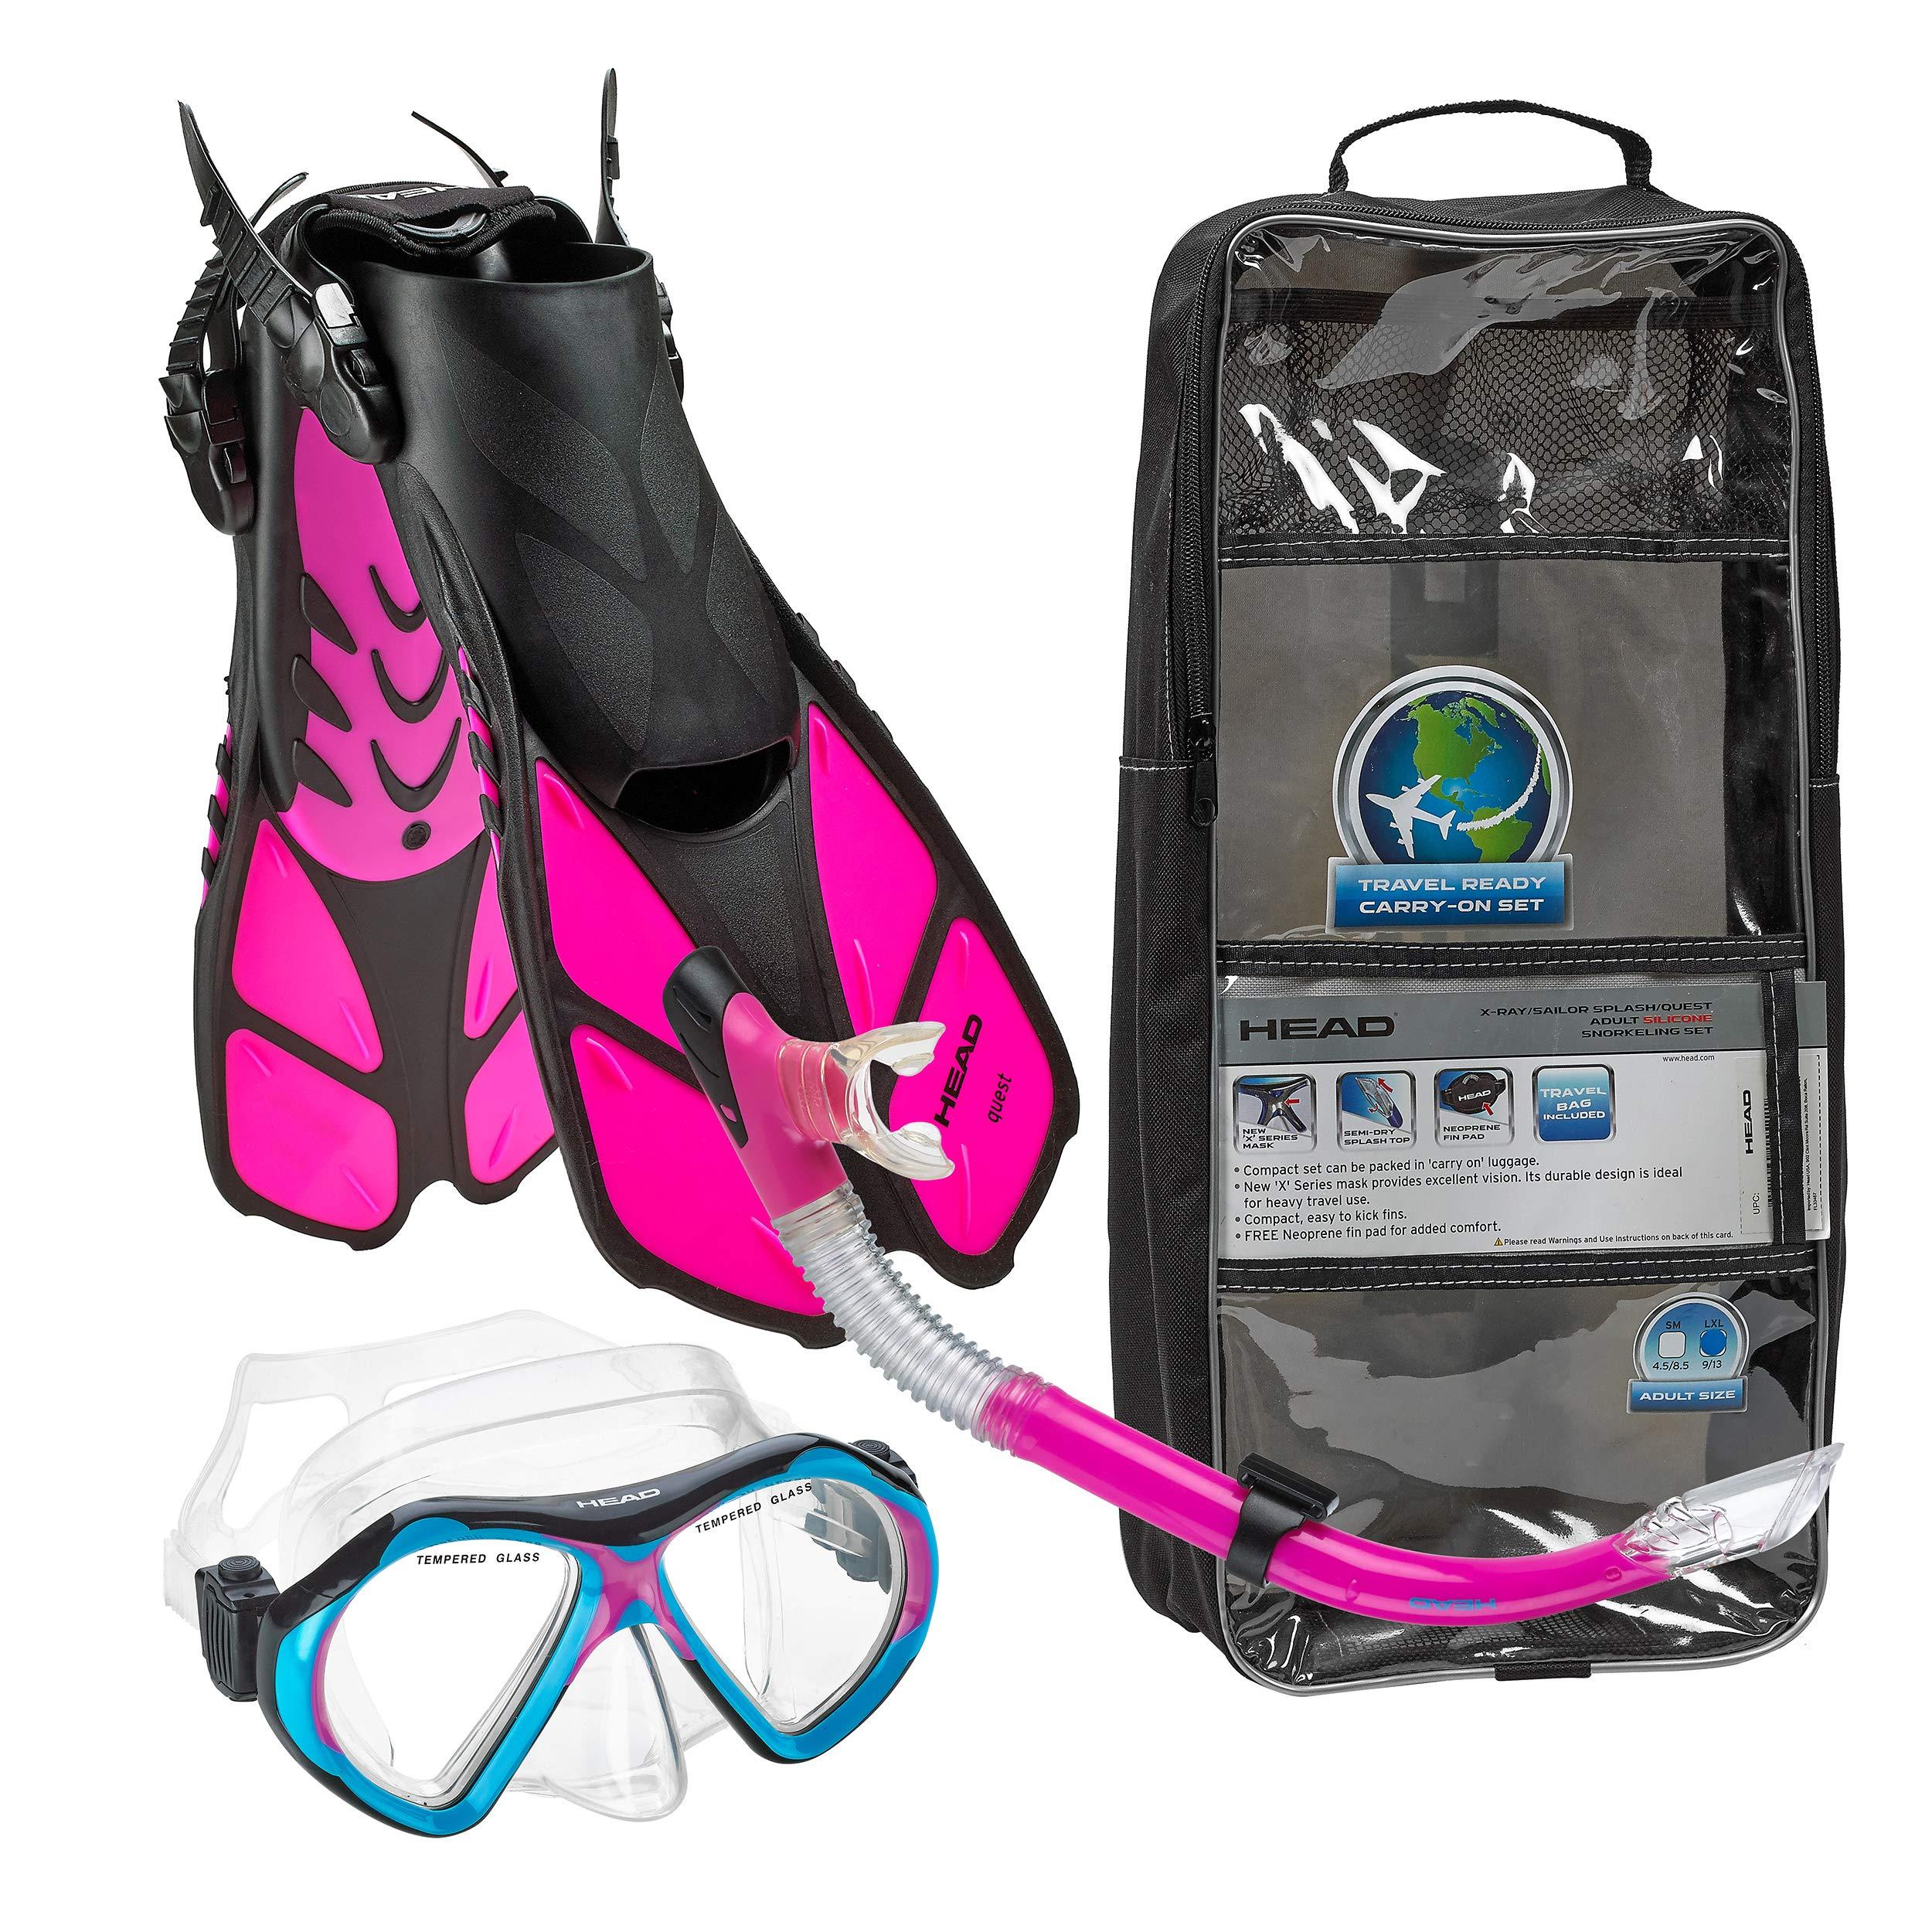 Aqualung Snorkel Set with Sport Diva 1 Lx Mask, Island Dry Snorkel and Trek Fin, Pink, Medium by HEAD